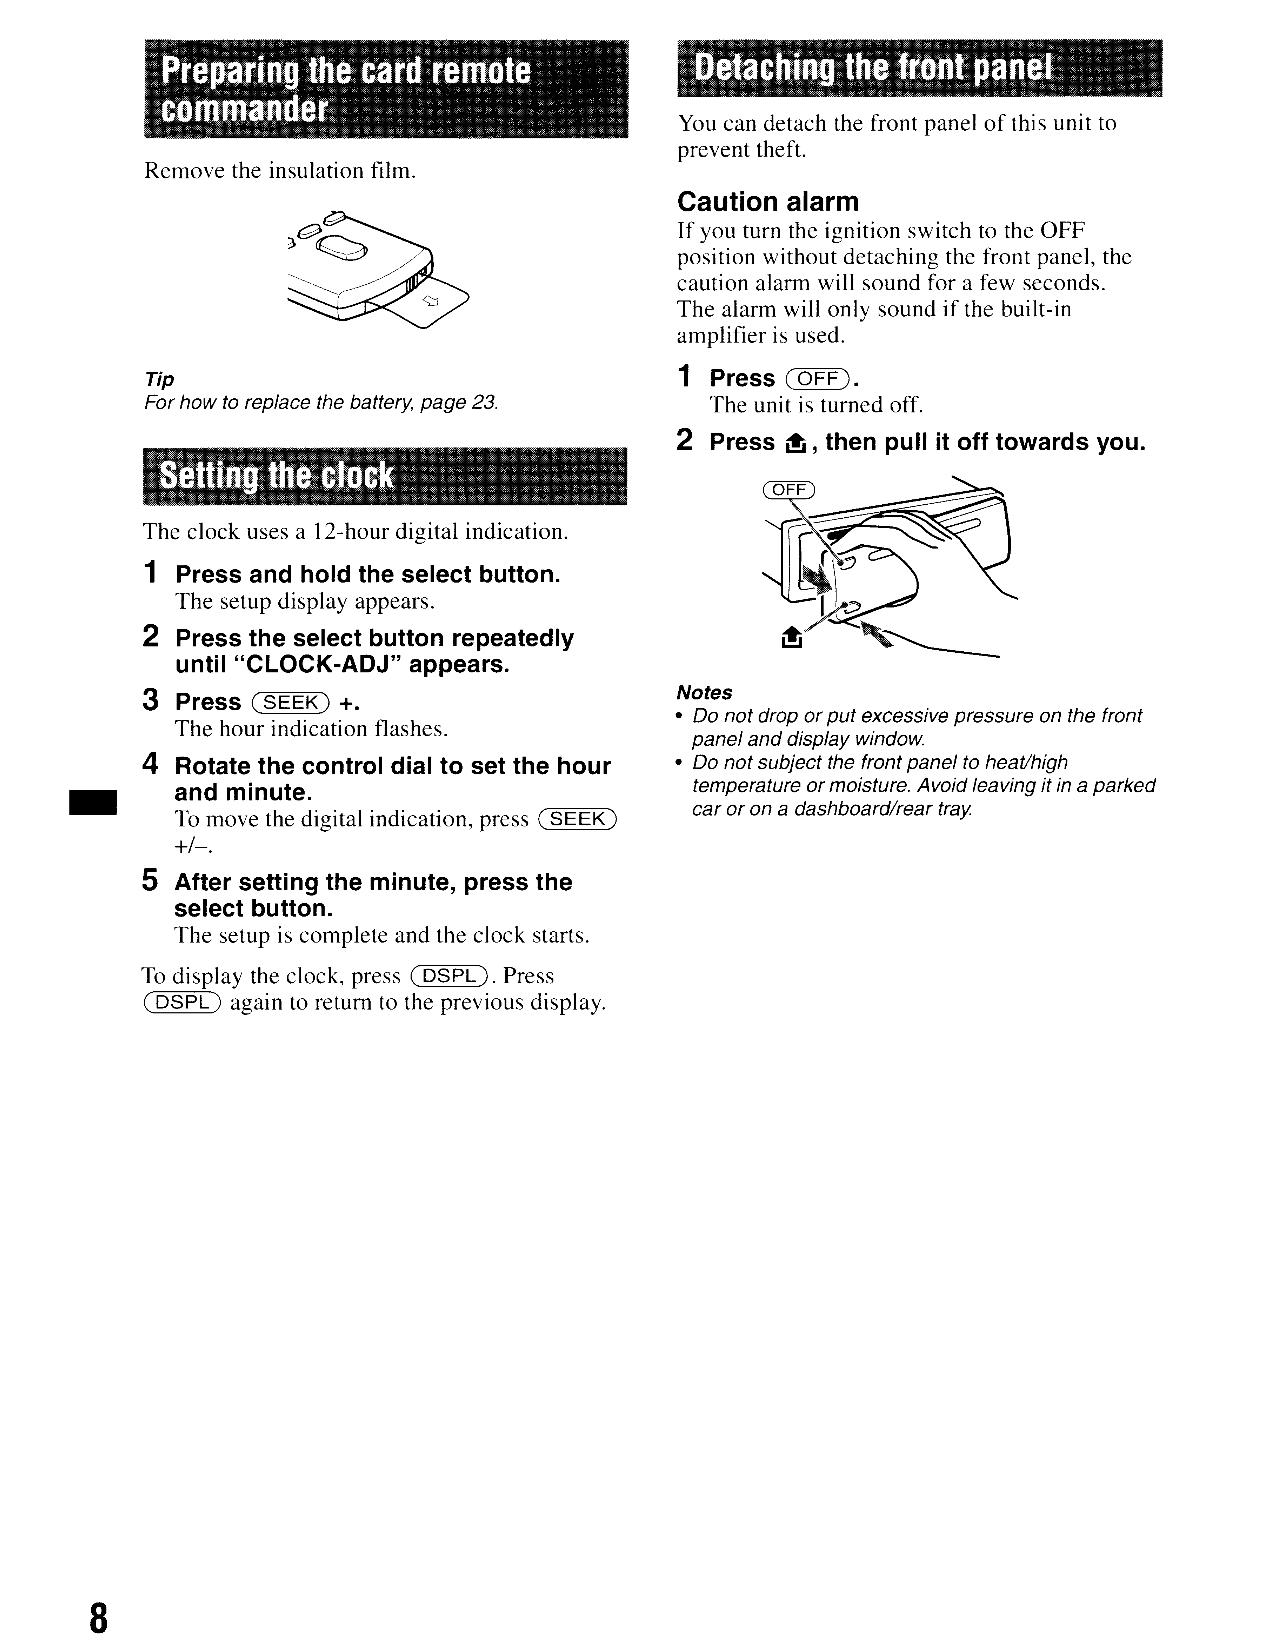 158mexbt27.pdf 7 pdf manual for sony car receiver xplod mex bt2700 sony mex-bt2700 manual pdf at n-0.co